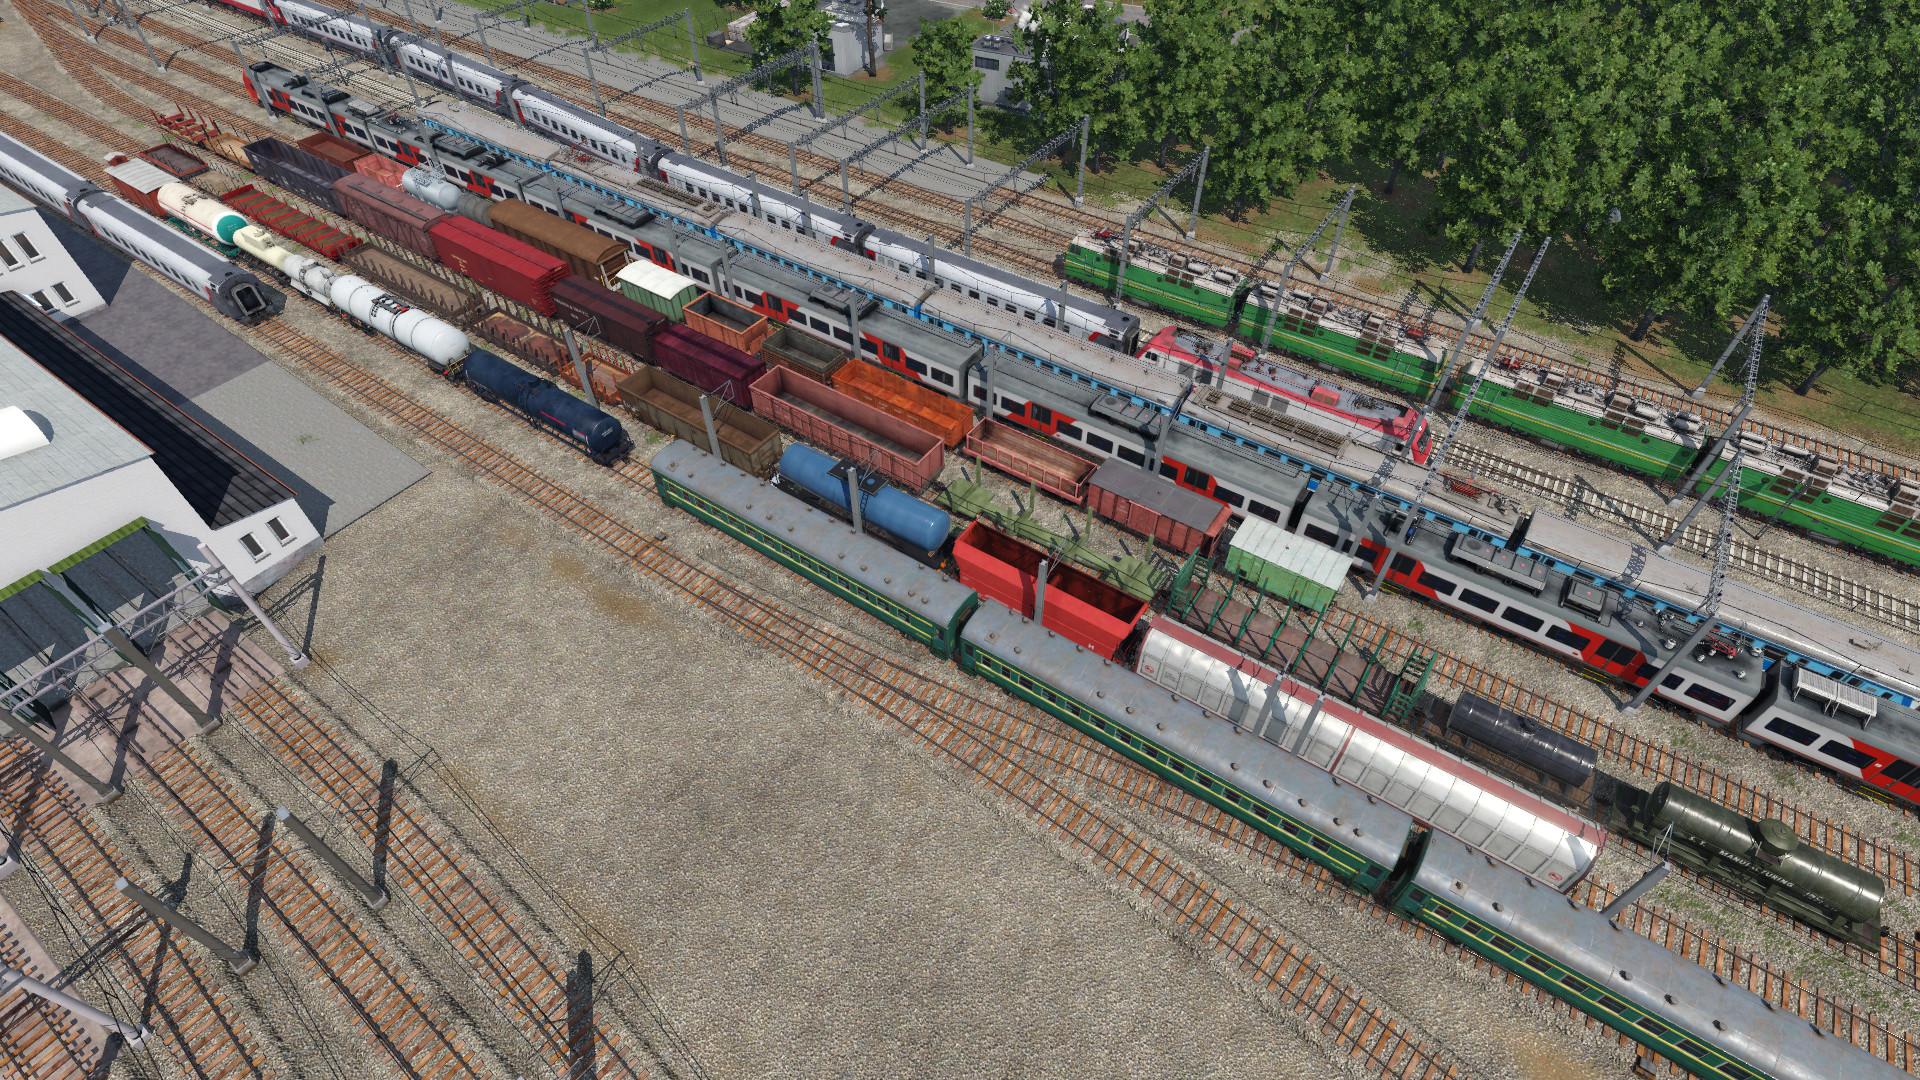 Transport Fever 2 - Cargo Wagons Assets